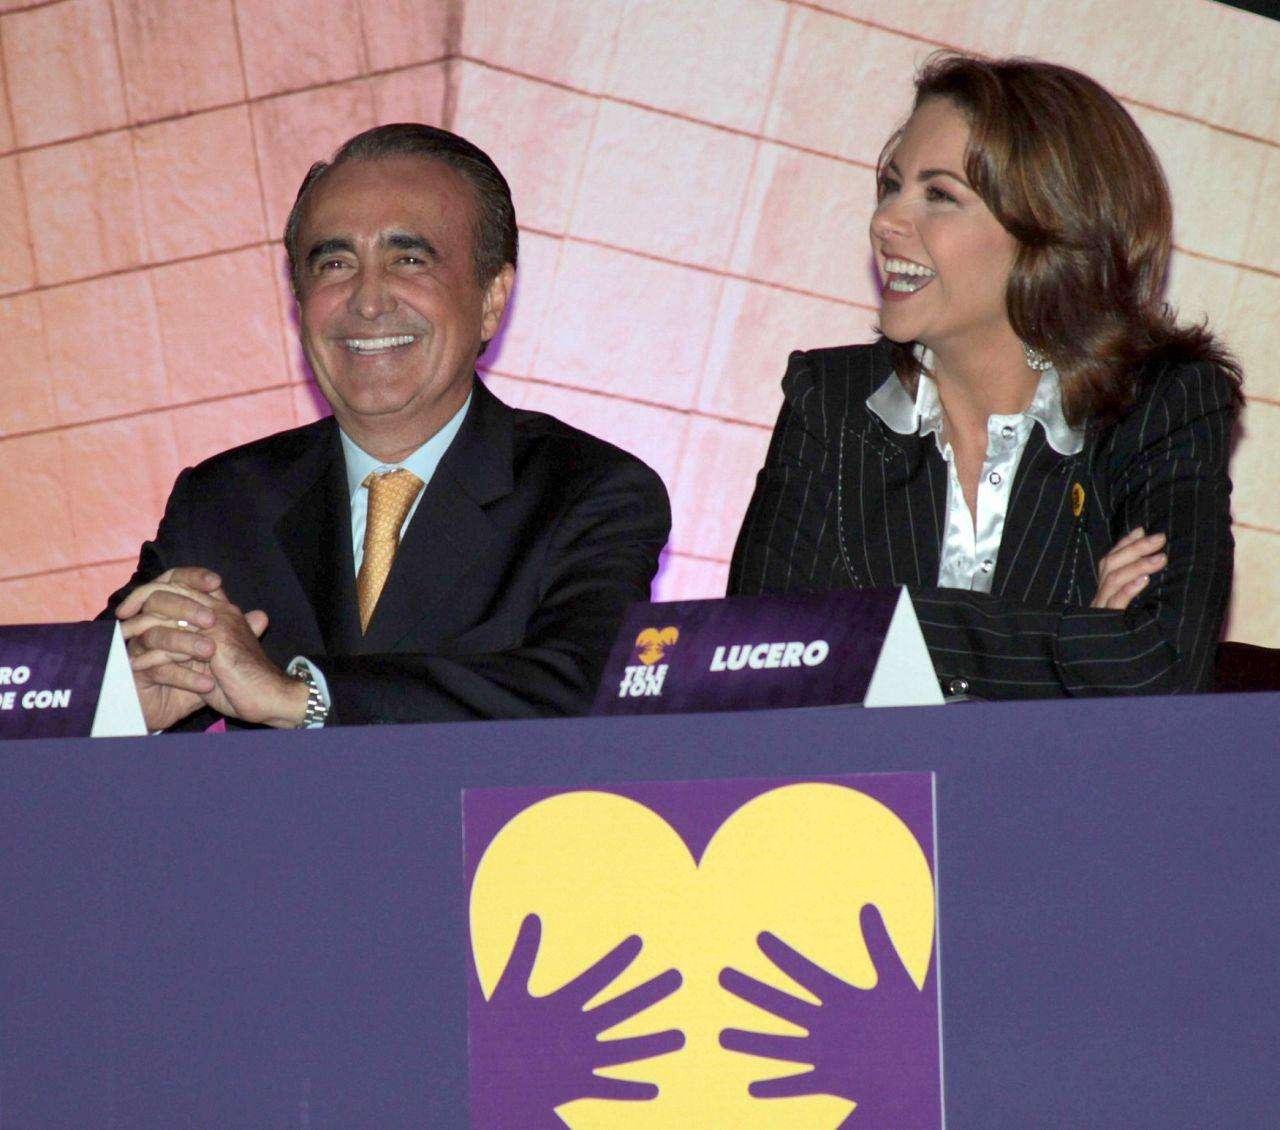 Se conforma elenco del Teletón sin Lucero Foto: Agencia Mezcalent